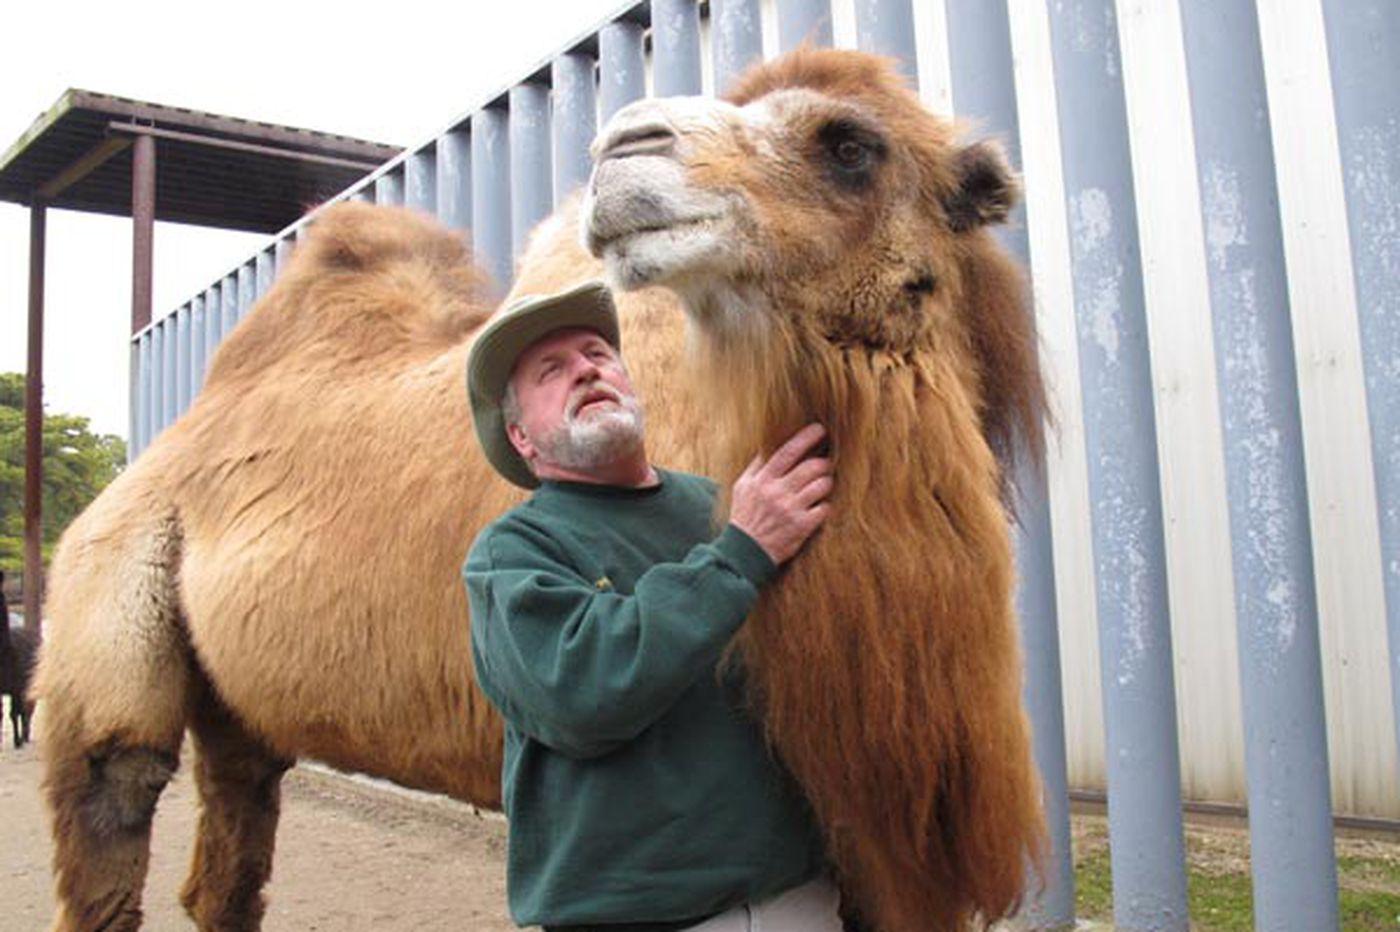 Jersey zoo camel picks Ravens to win Super Bowl